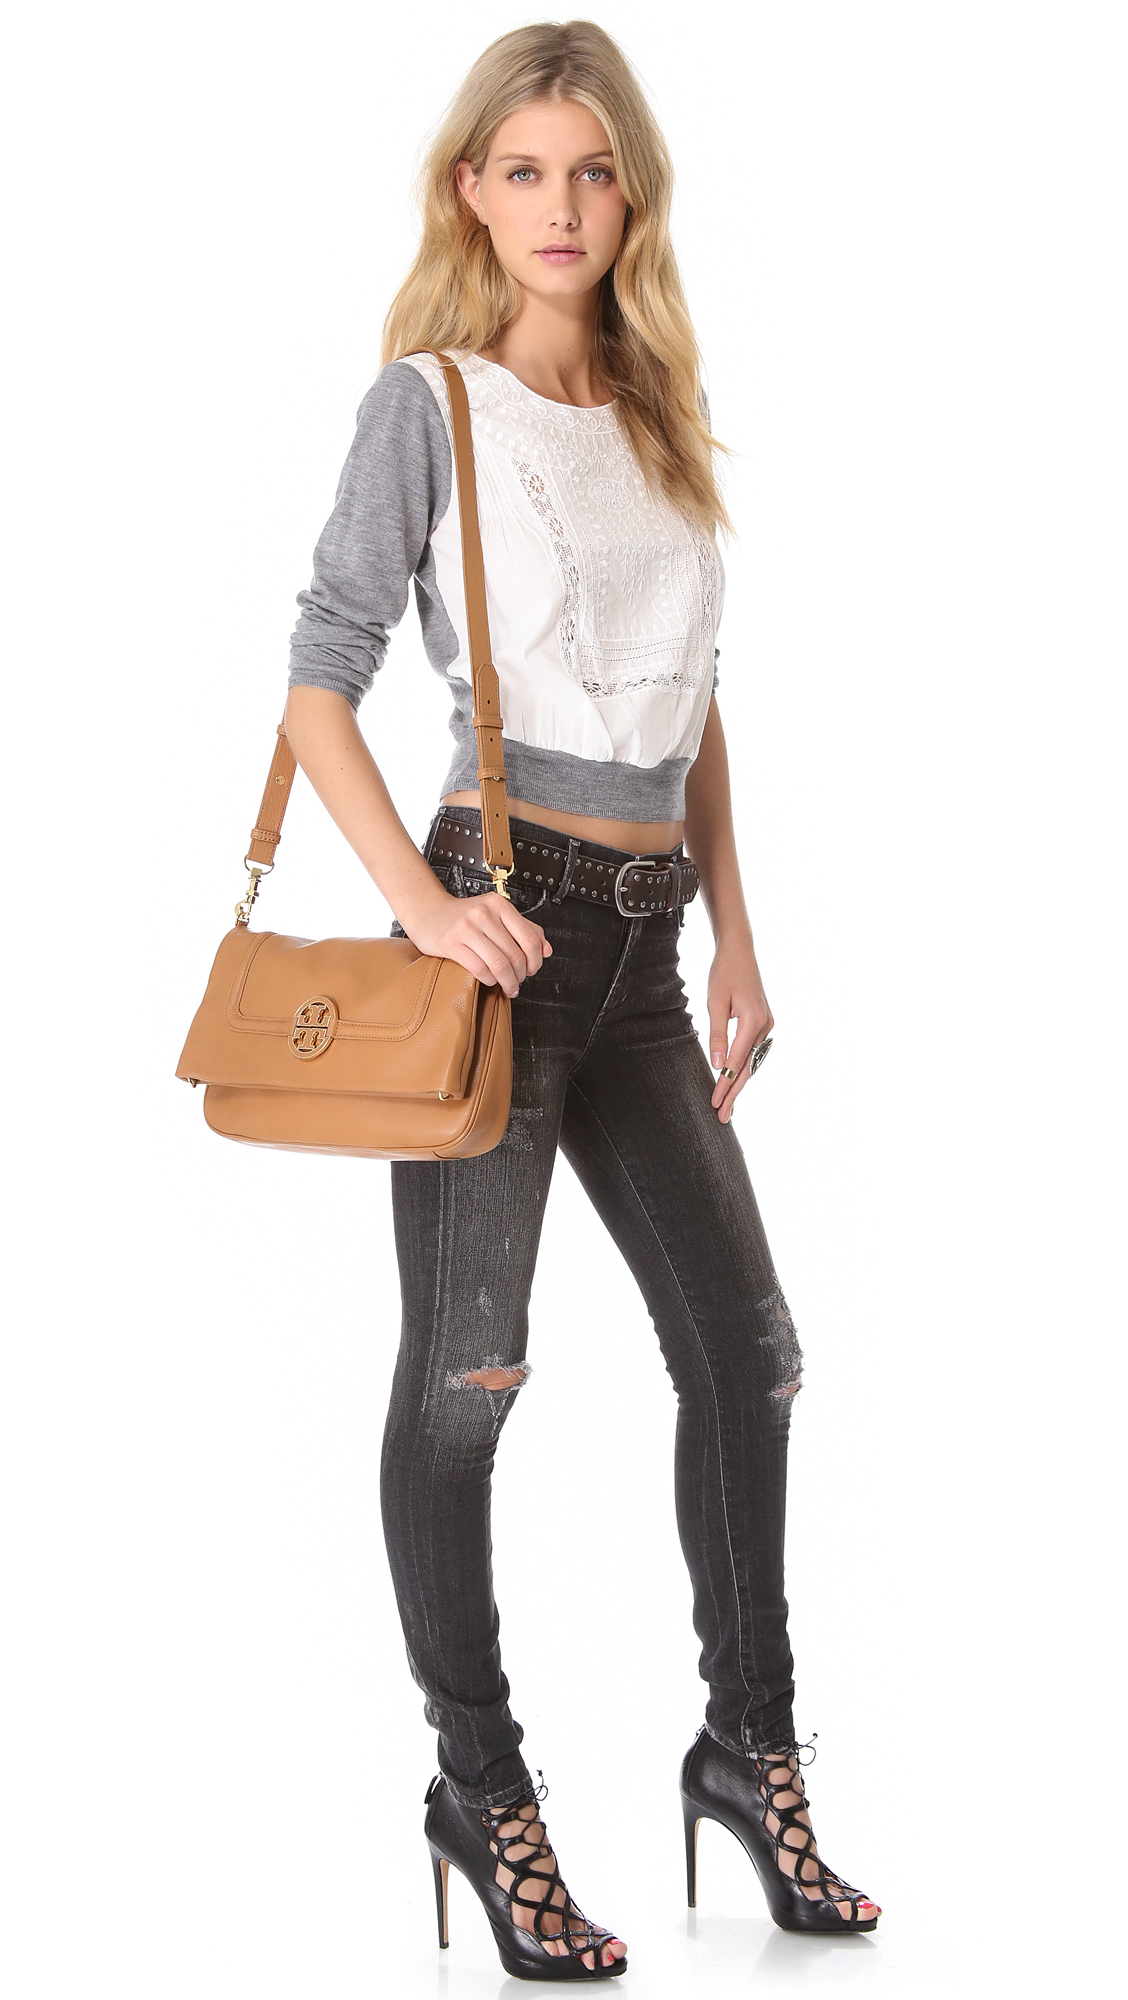 37e72fdc551cd Tory Burch Amanda Fold Over Messenger Bag